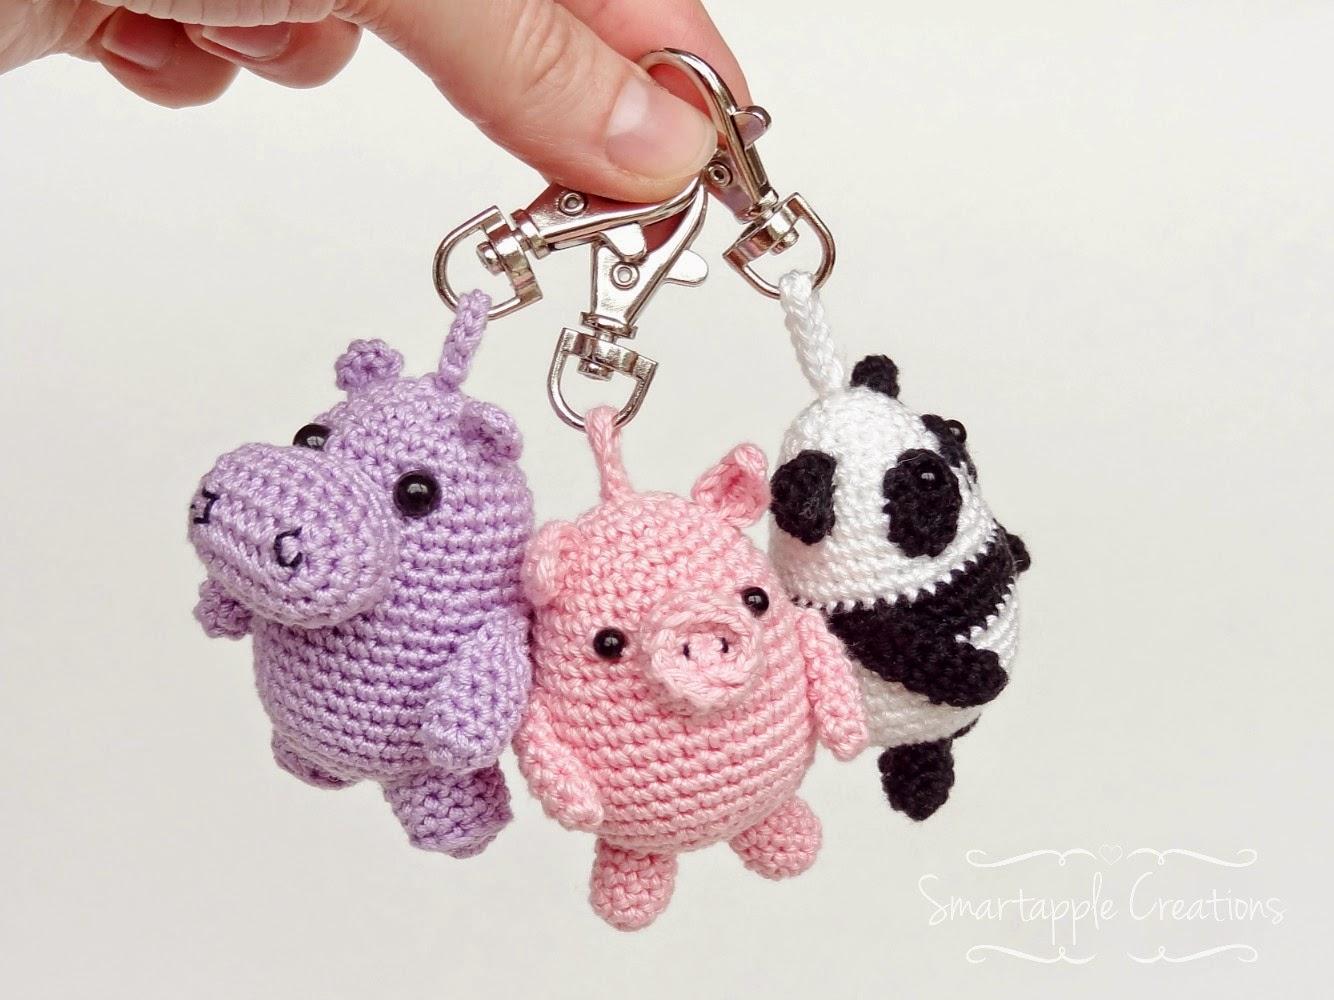 Little Lucas Free Amigurumi Pattern : Smartapple Creations - amigurumi and crochet: Amigurumi ...